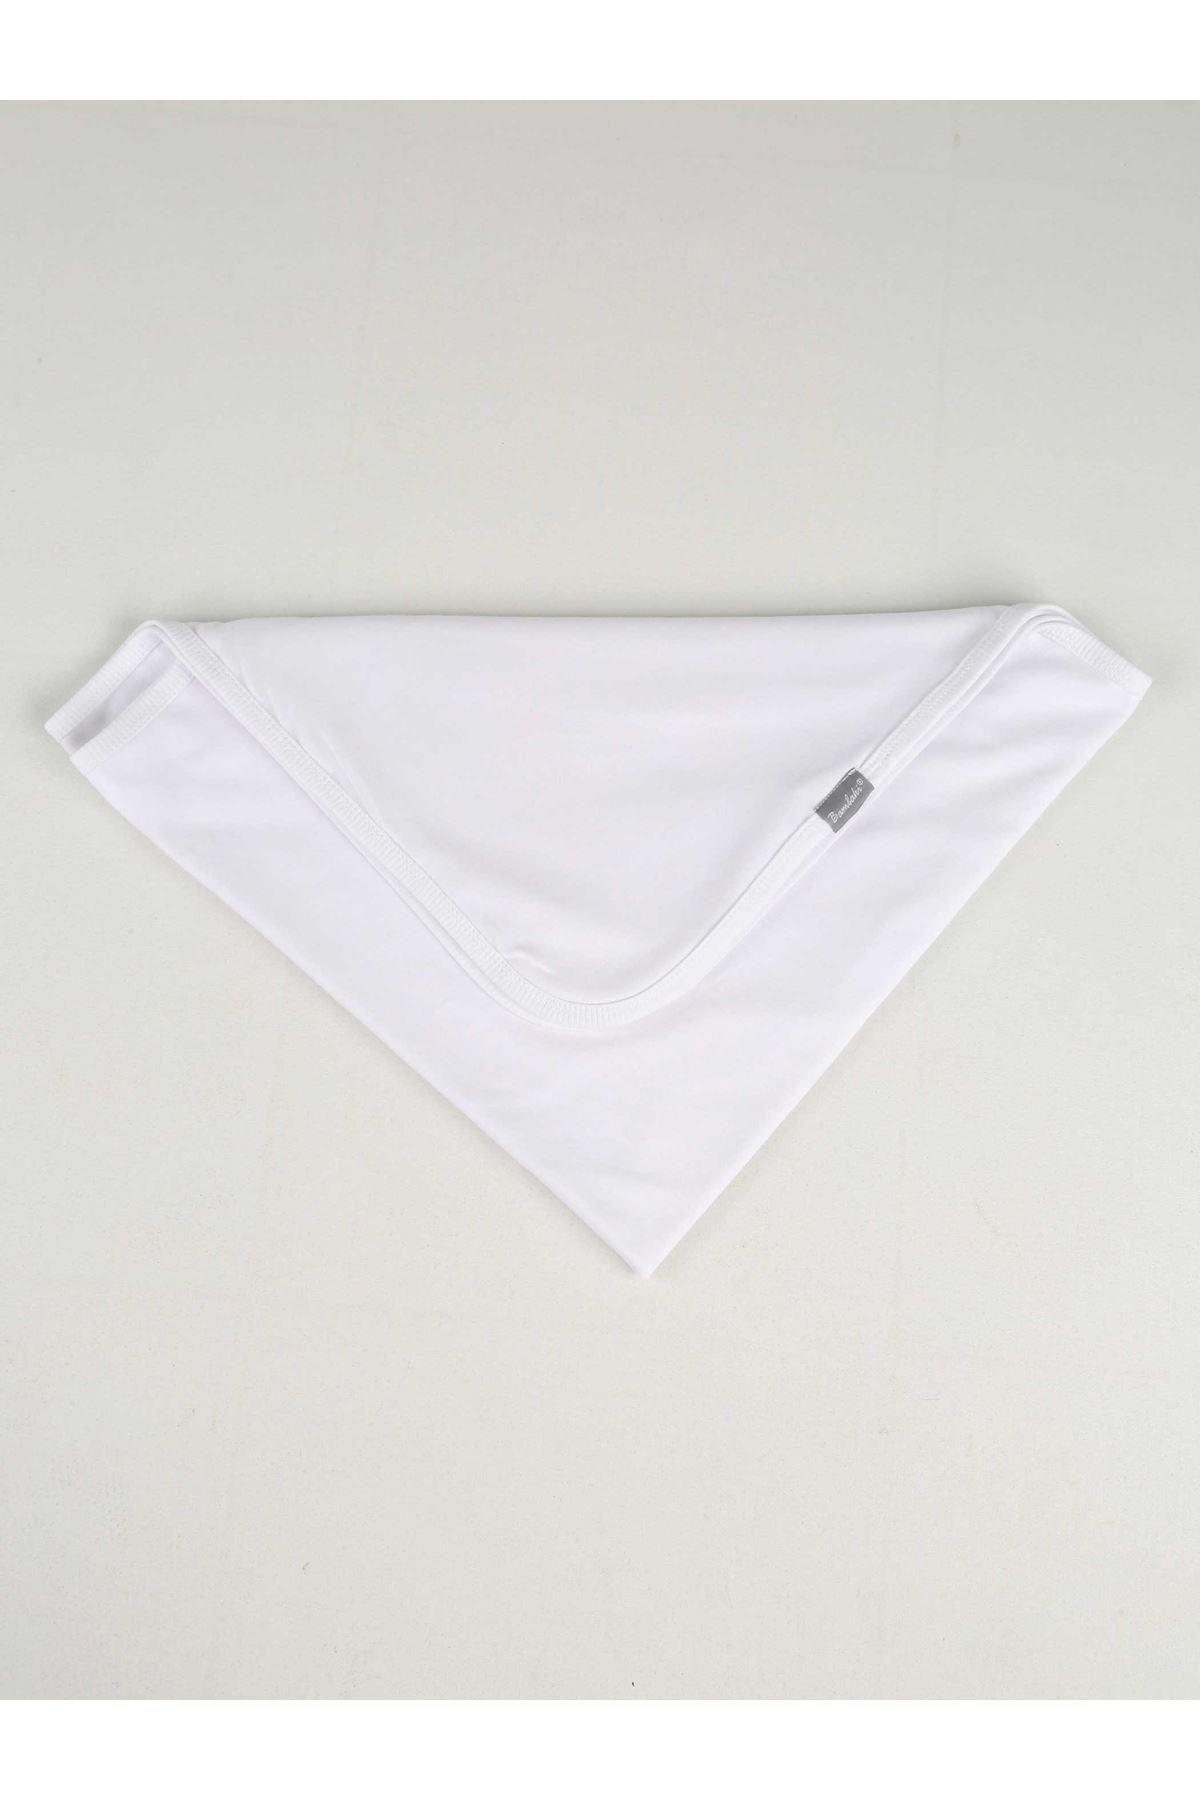 White Newborn Baby Blanket